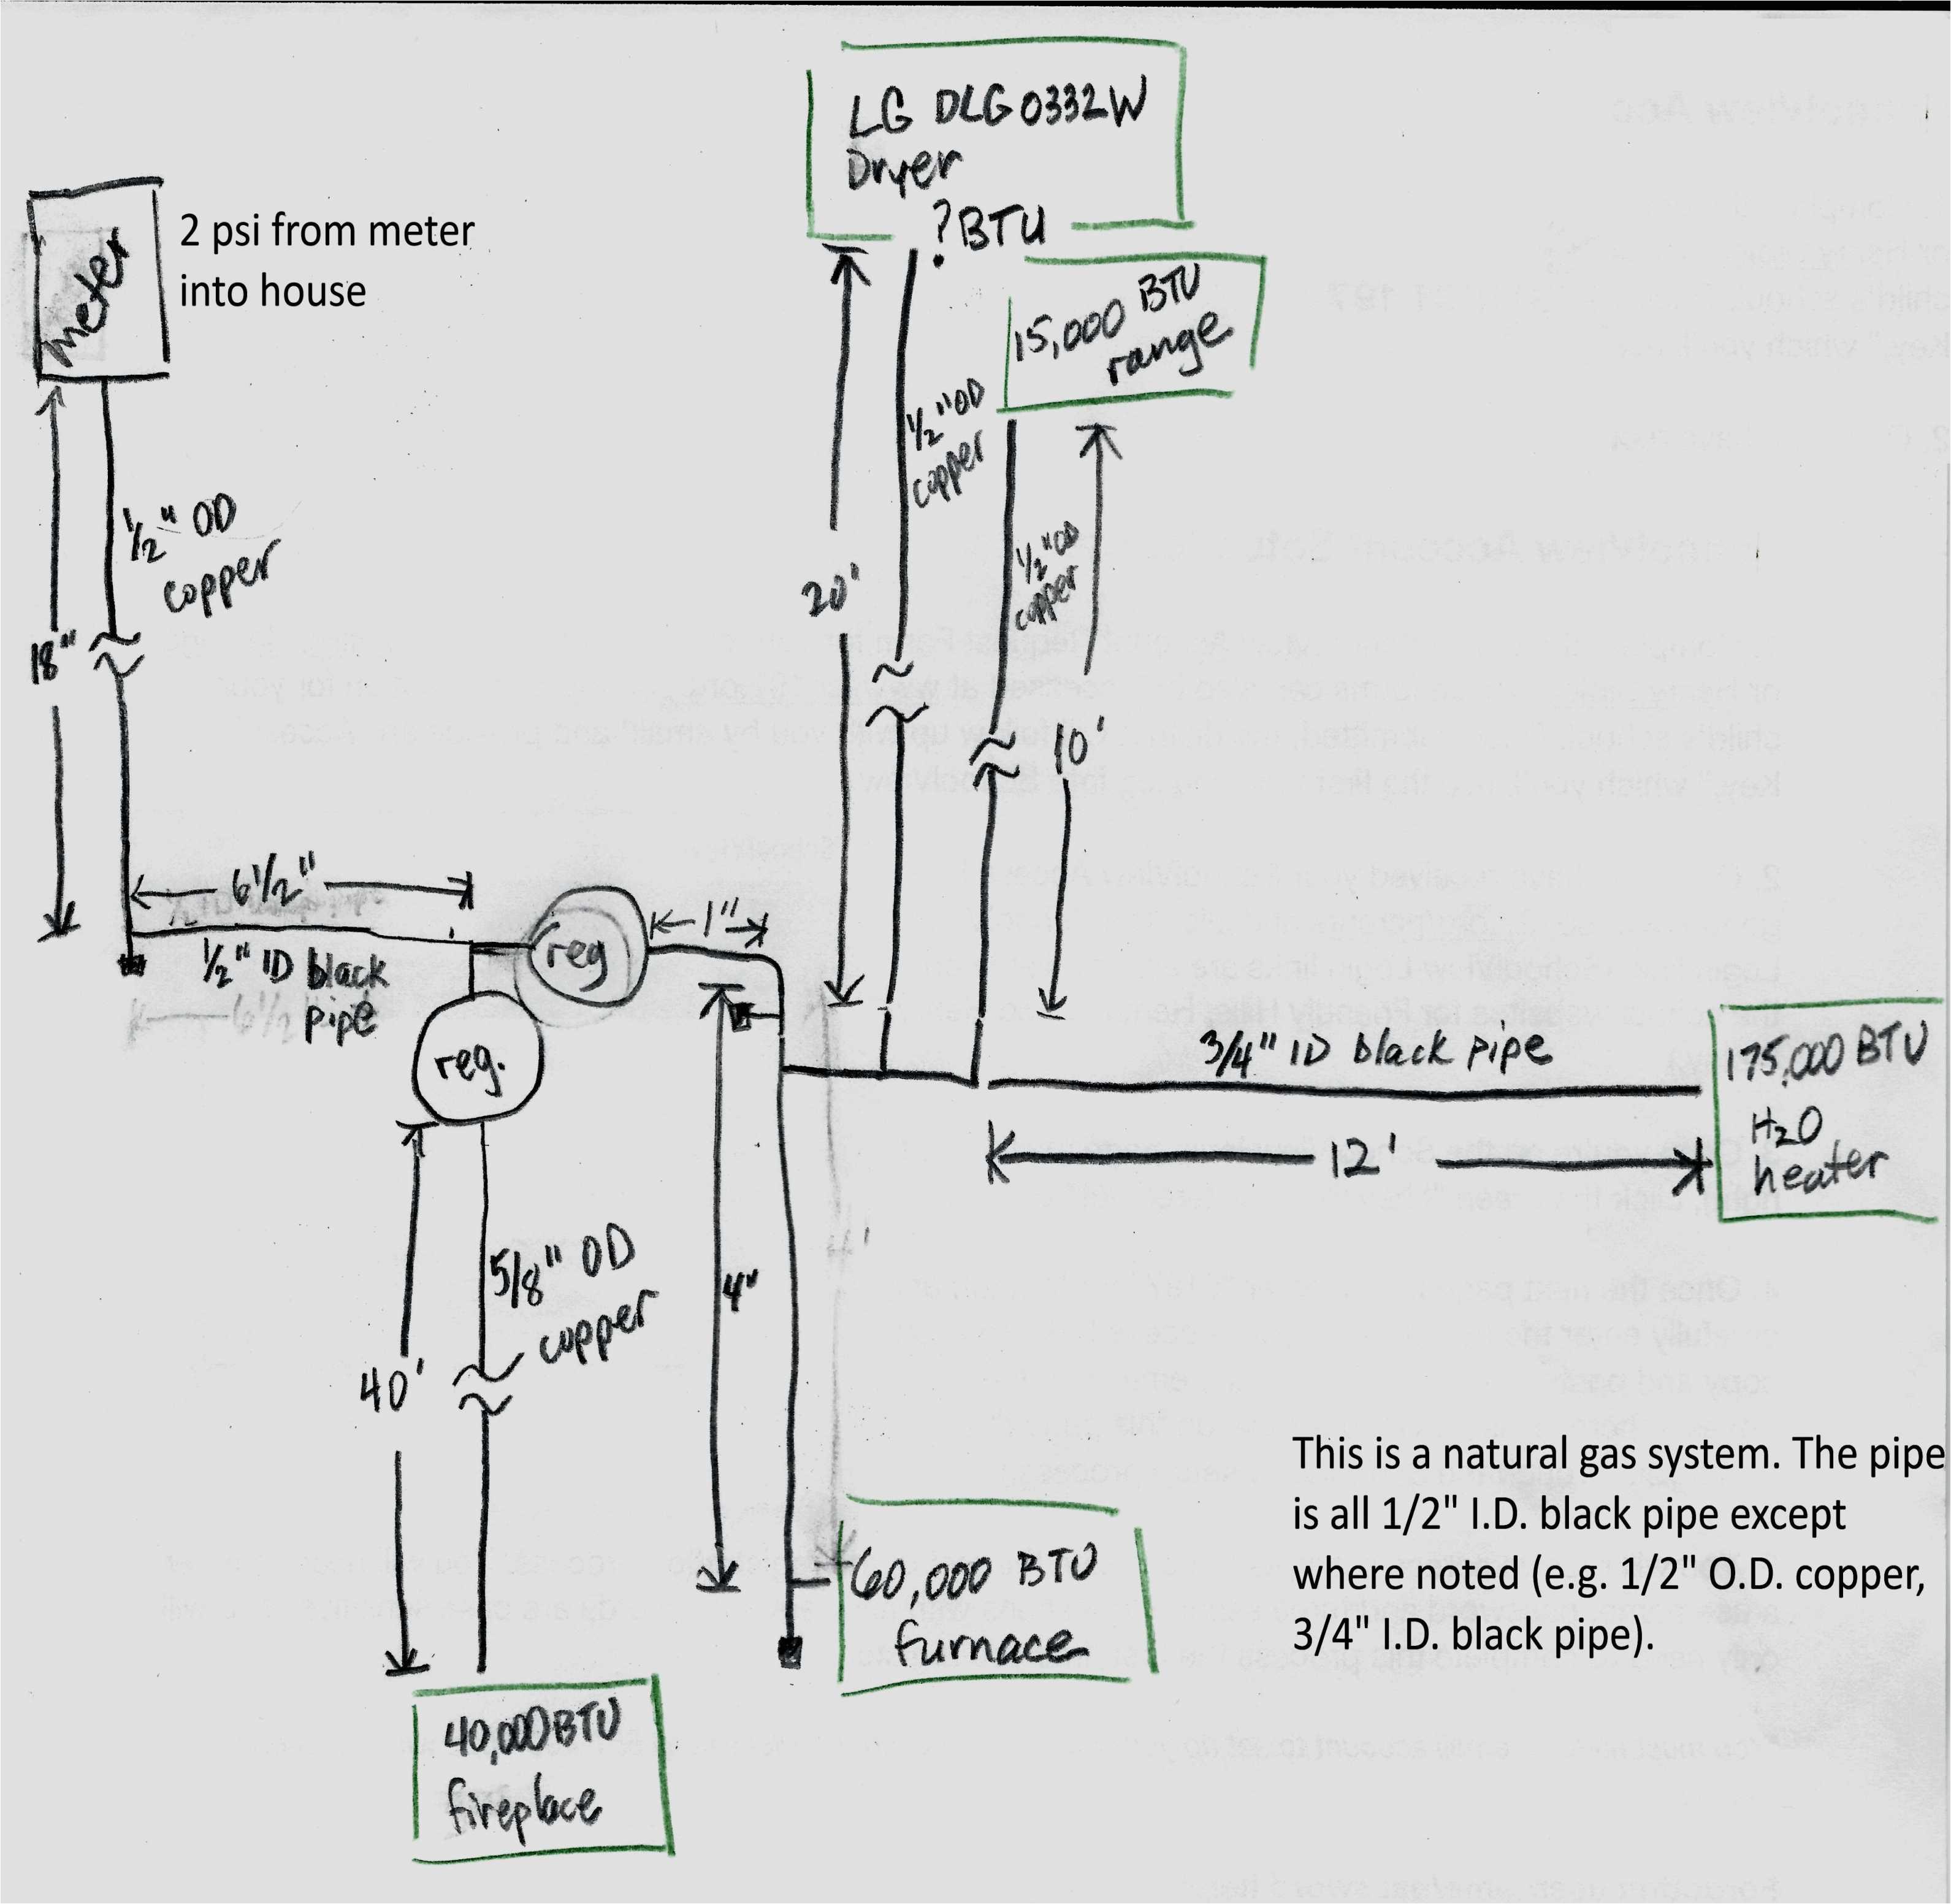 rheostat wiring diagram wiring diagram data dual fan wiring diagram 120v rheostat